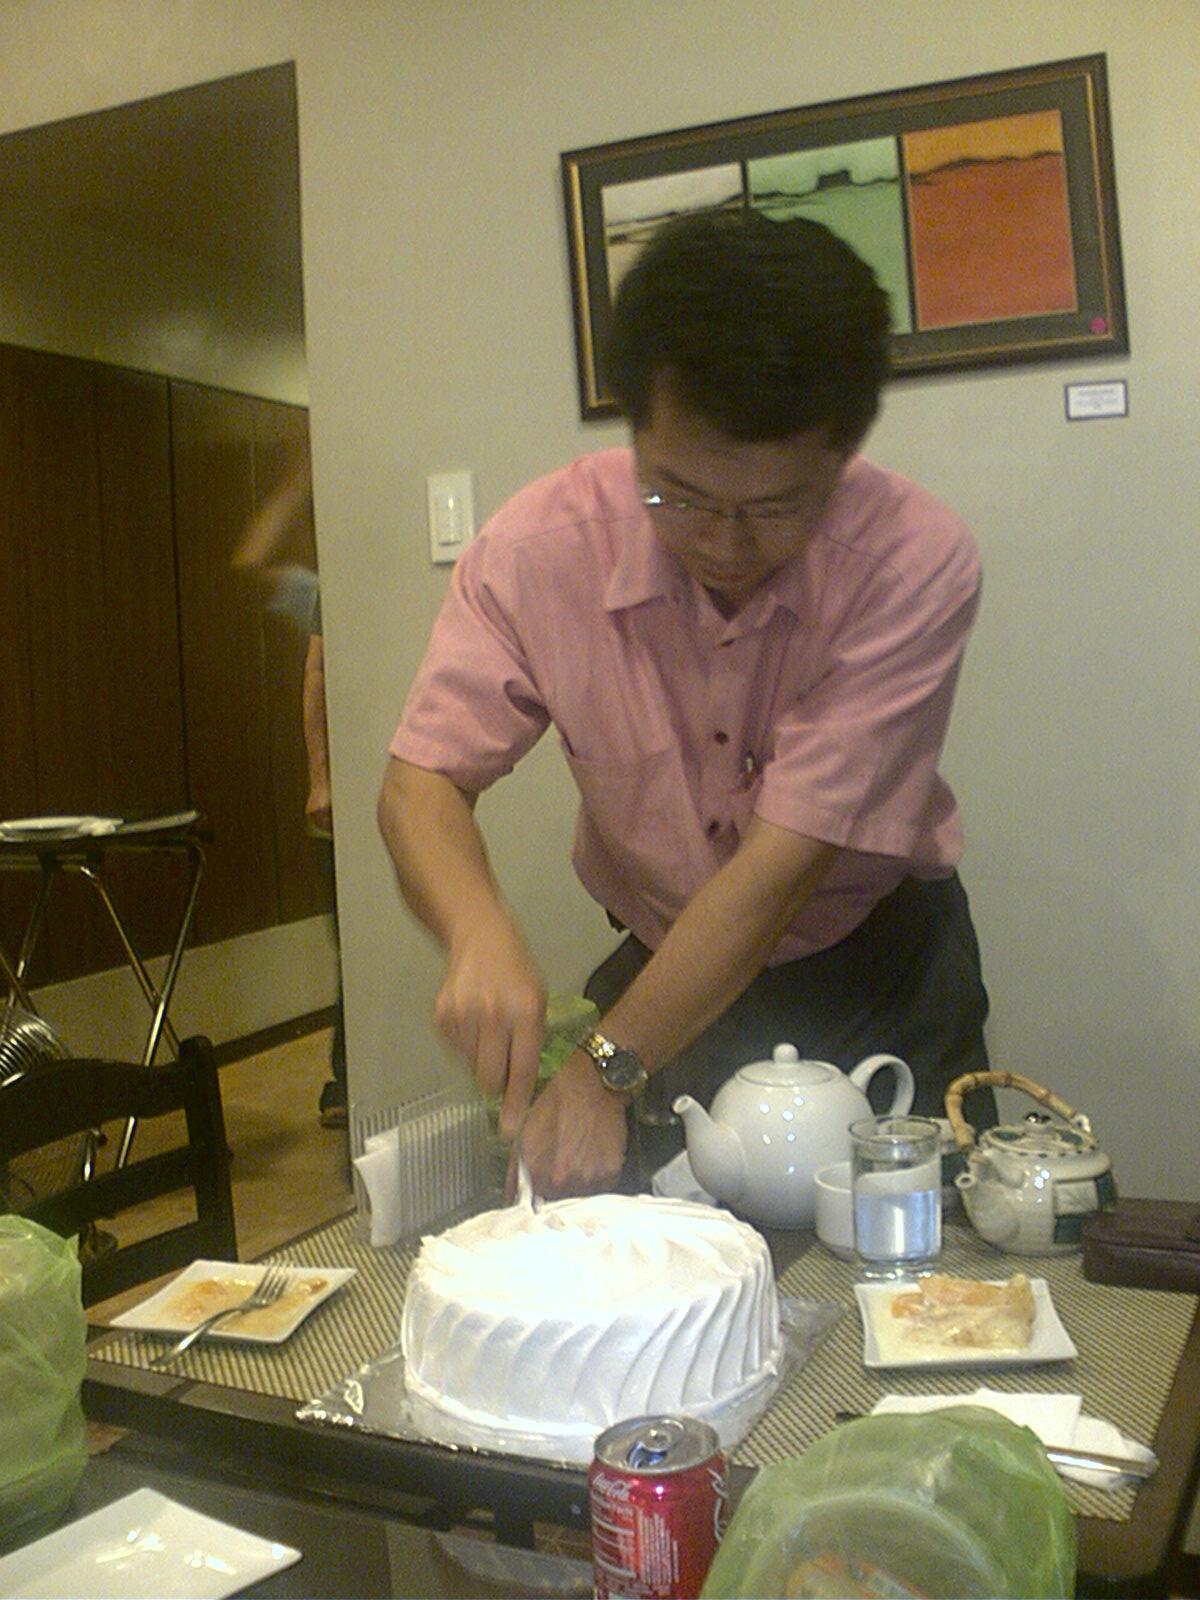 jong slicing the cake